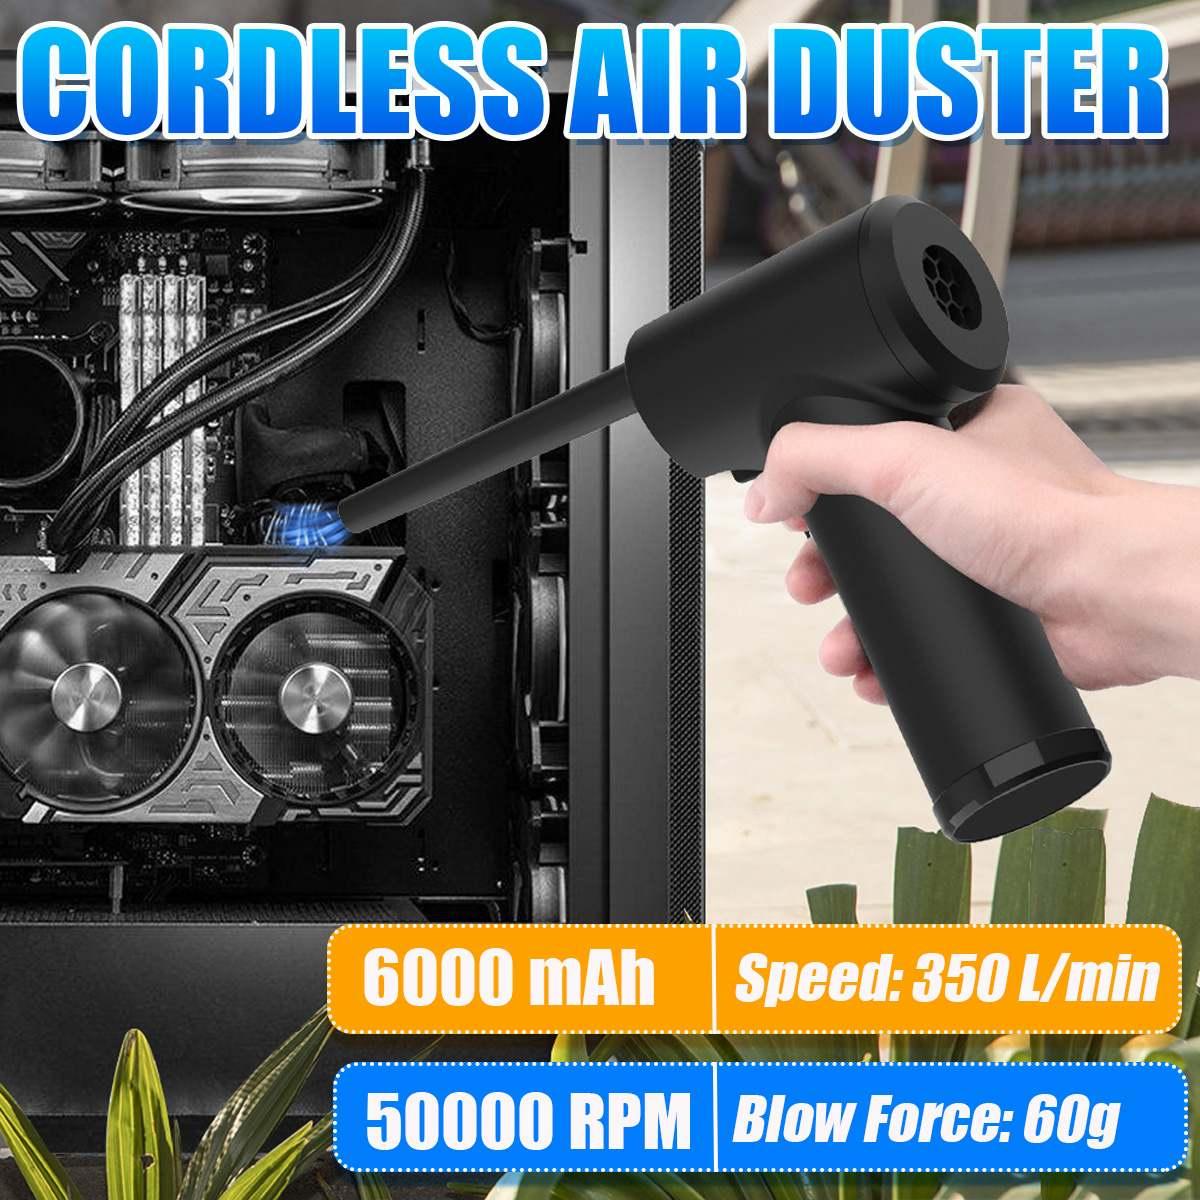 50000 RPM اللاسلكي منظف بالهواء المضغوط منفاخ الهواء مكنسة كهربائية لأجهزة الكمبيوتر المحمول لوحة المفاتيح إلكترونيات تنظيف للكاميرا